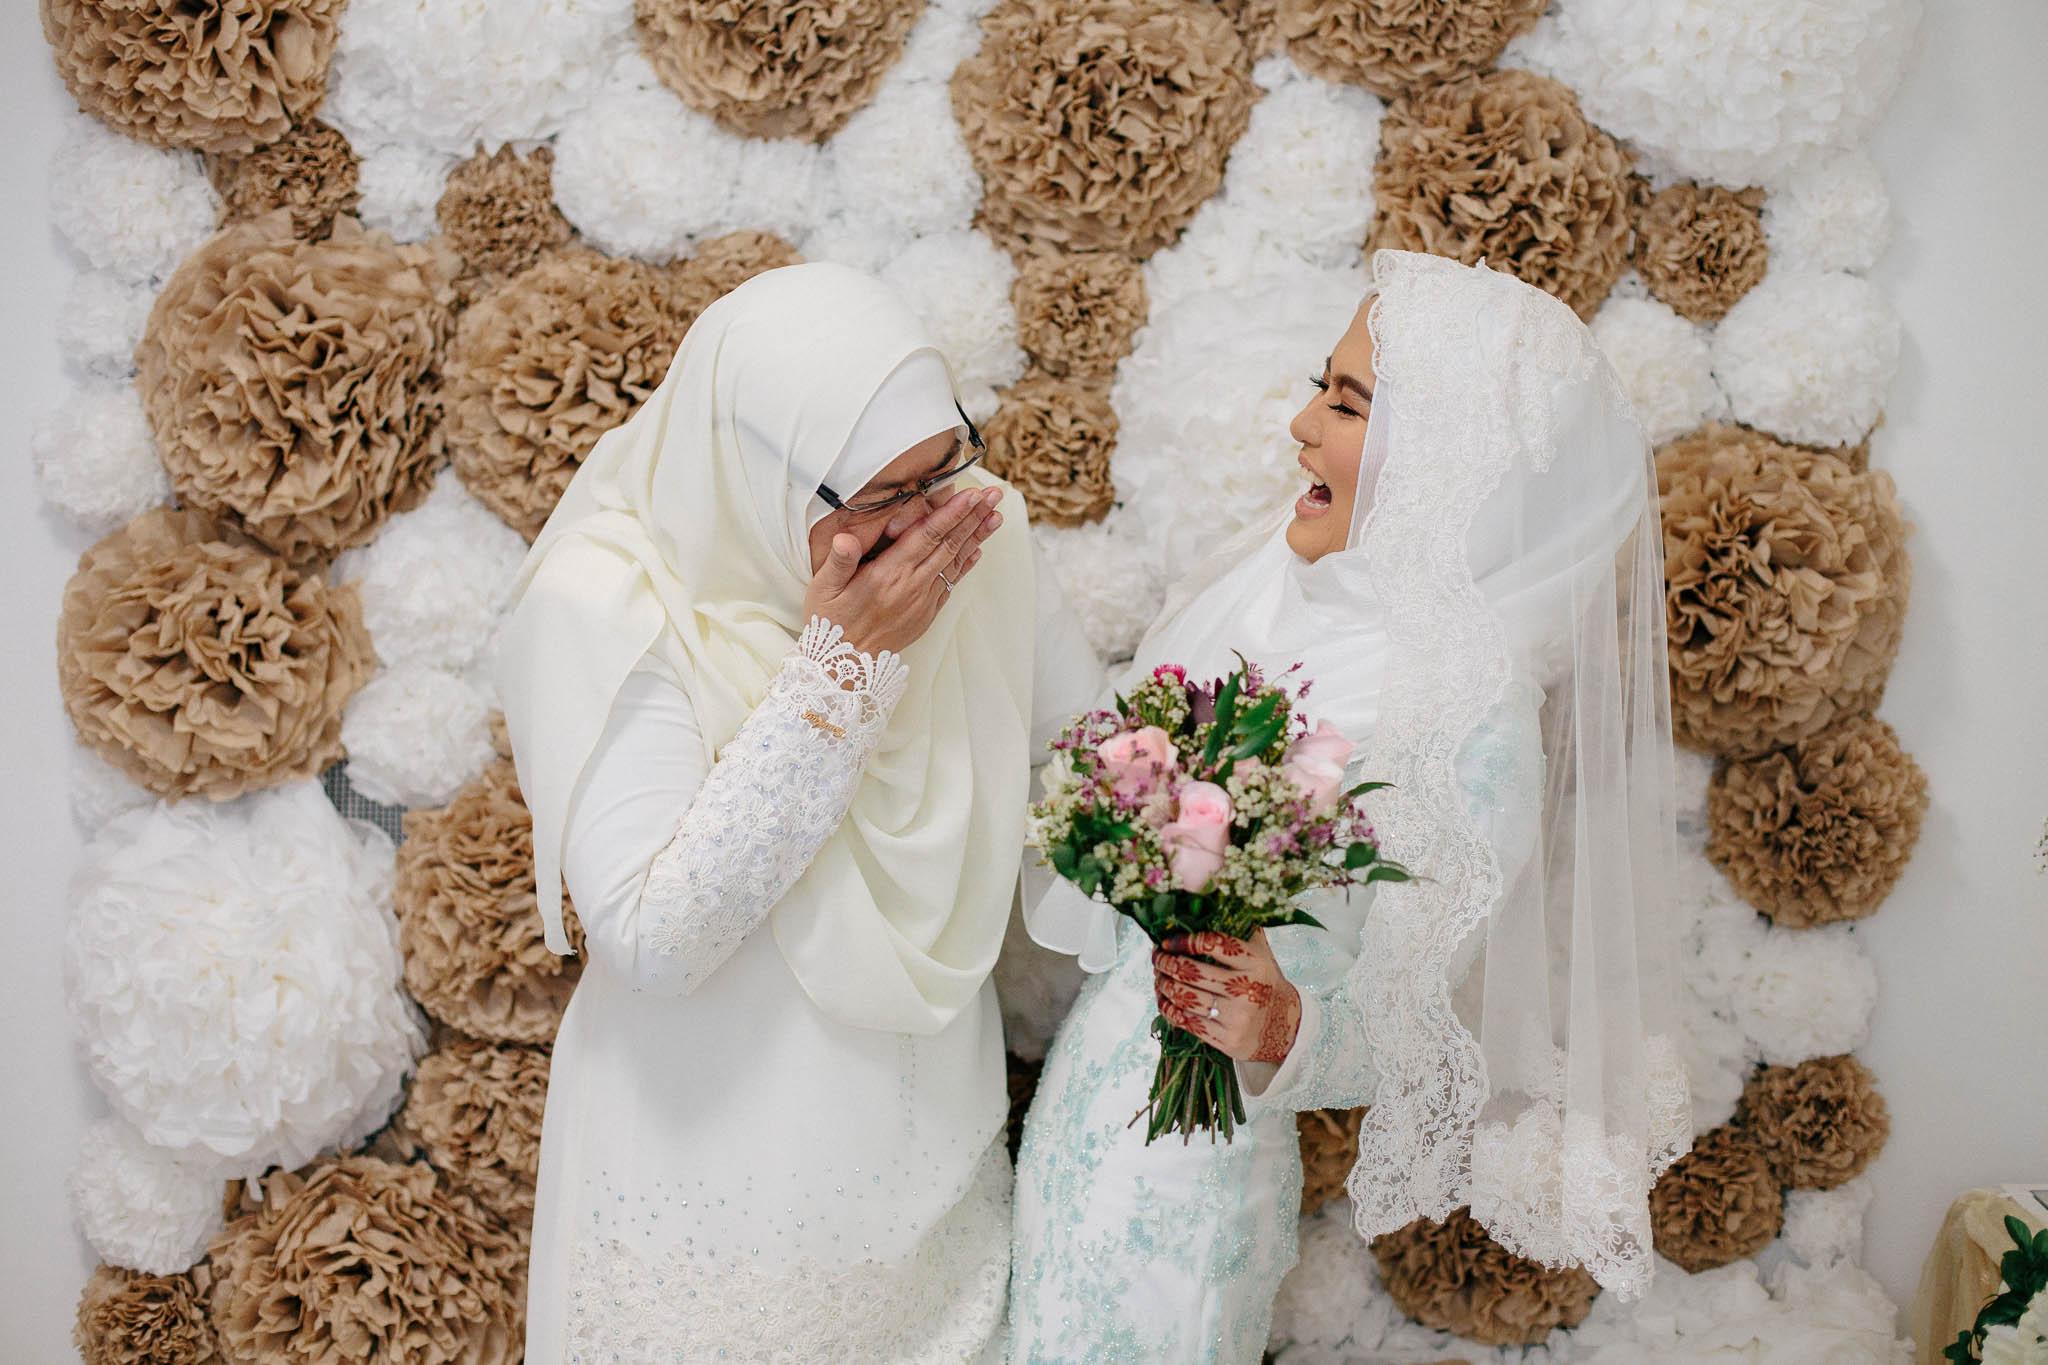 singapore-wedding-photographer-sharalyn-syazwan-008.jpg